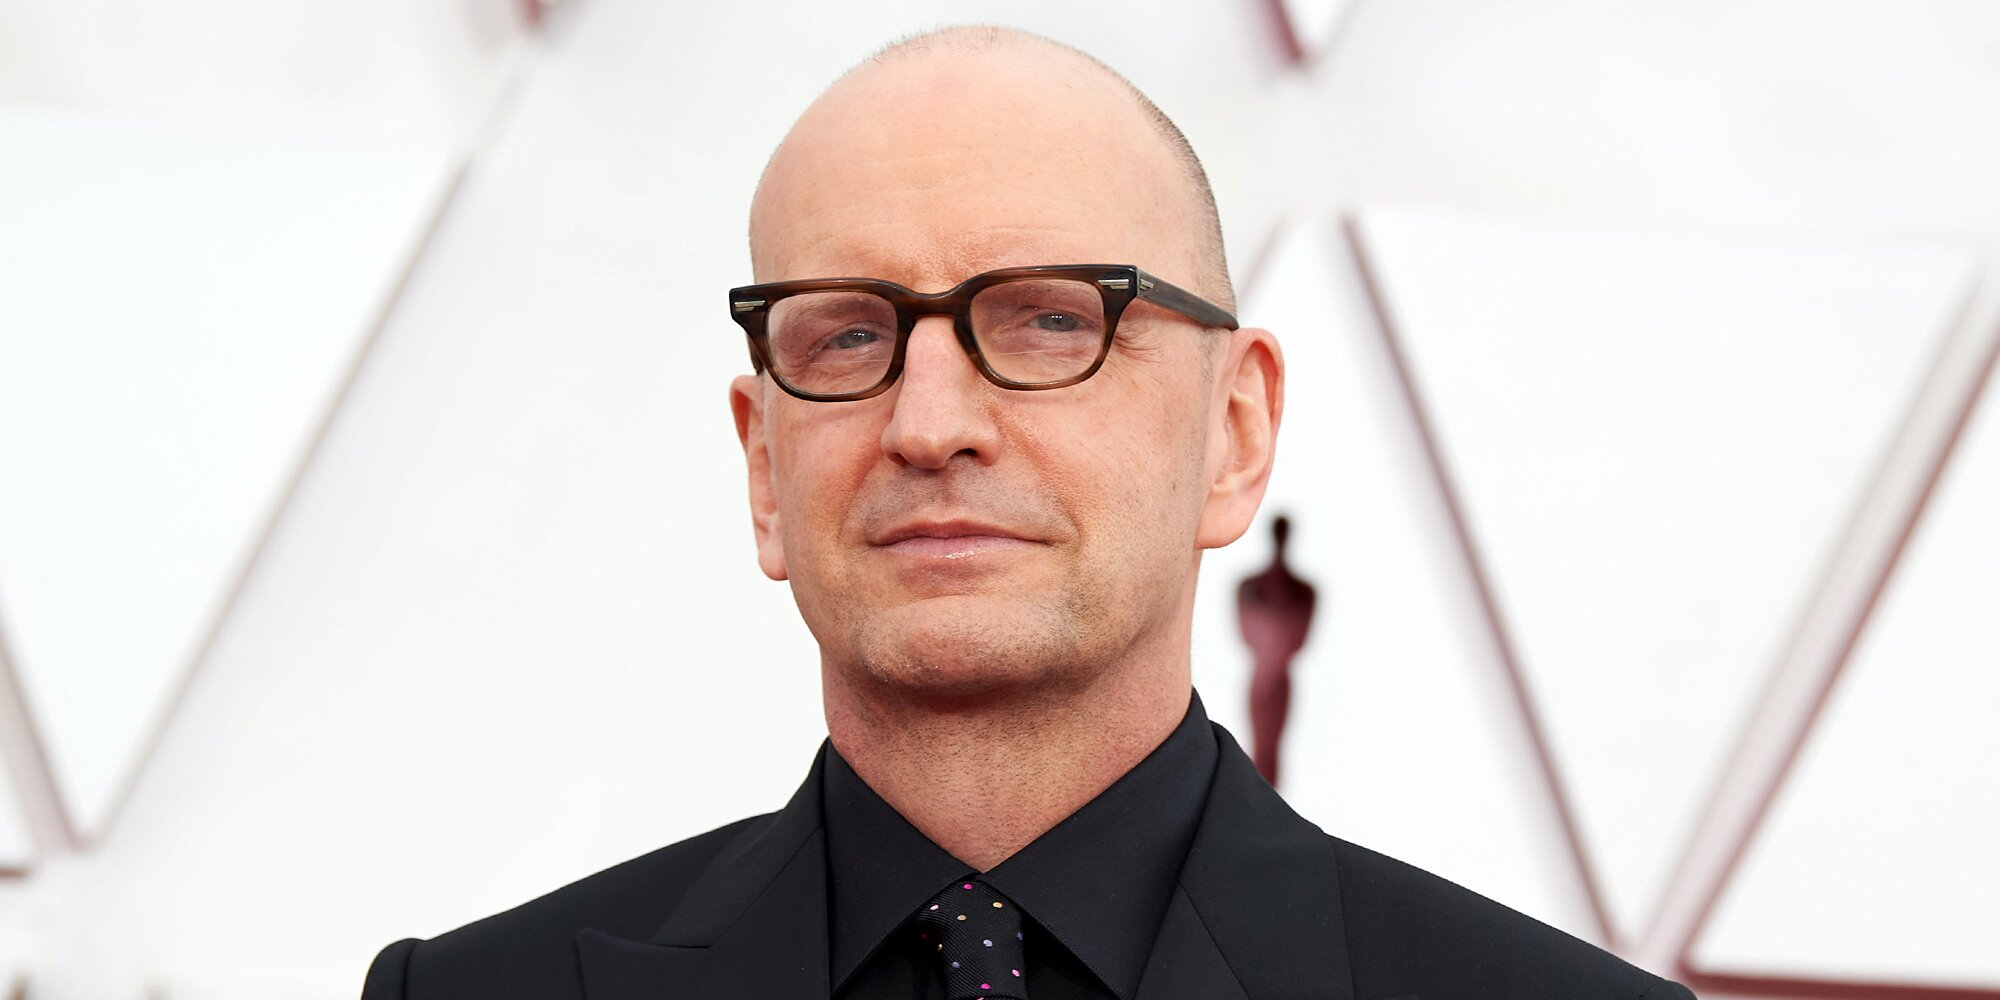 Oscars producer Steven Soderbergh explains decision to change the order of final awards